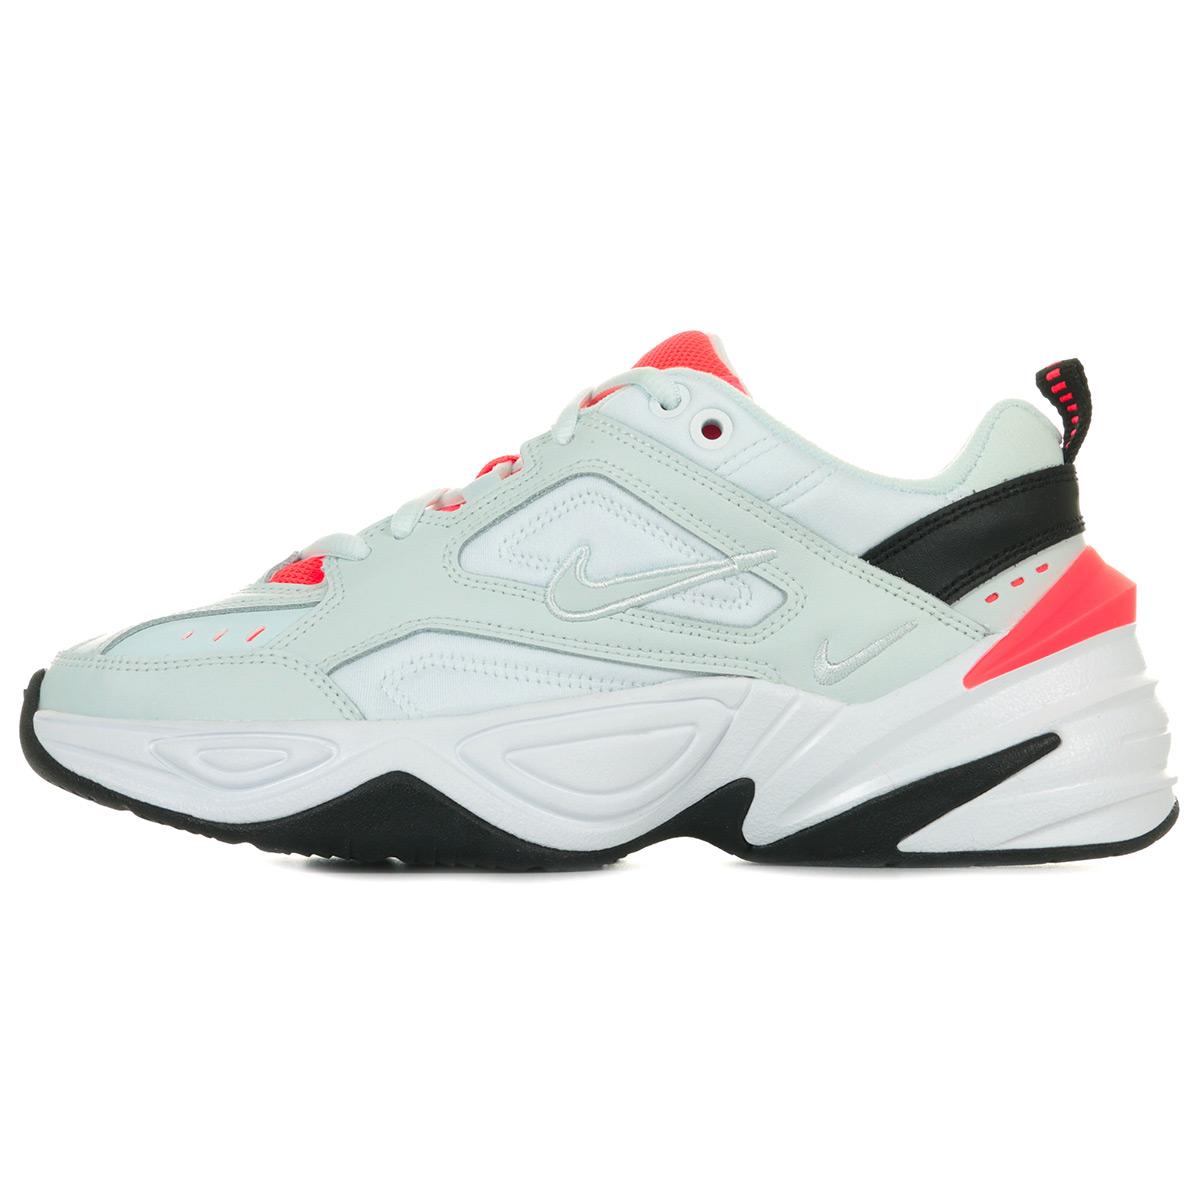 Nike M2K Tekno Ghost Aqua AO3108401, Baskets mode femme